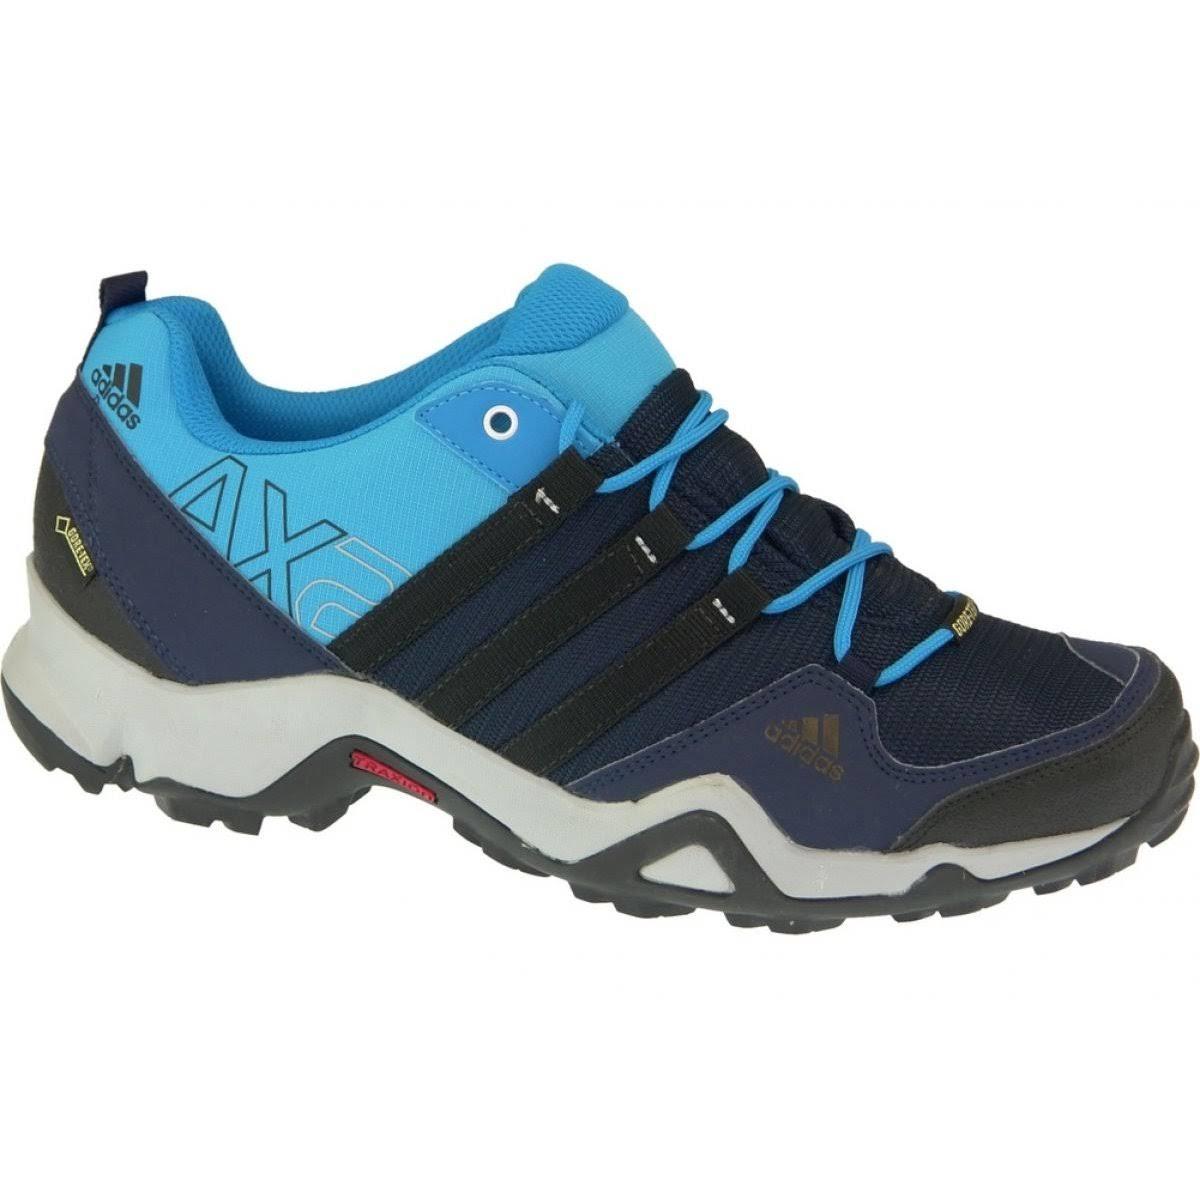 (7) Adidas AX2 GTX M29434 Mens Navy Blue Sports Shoes